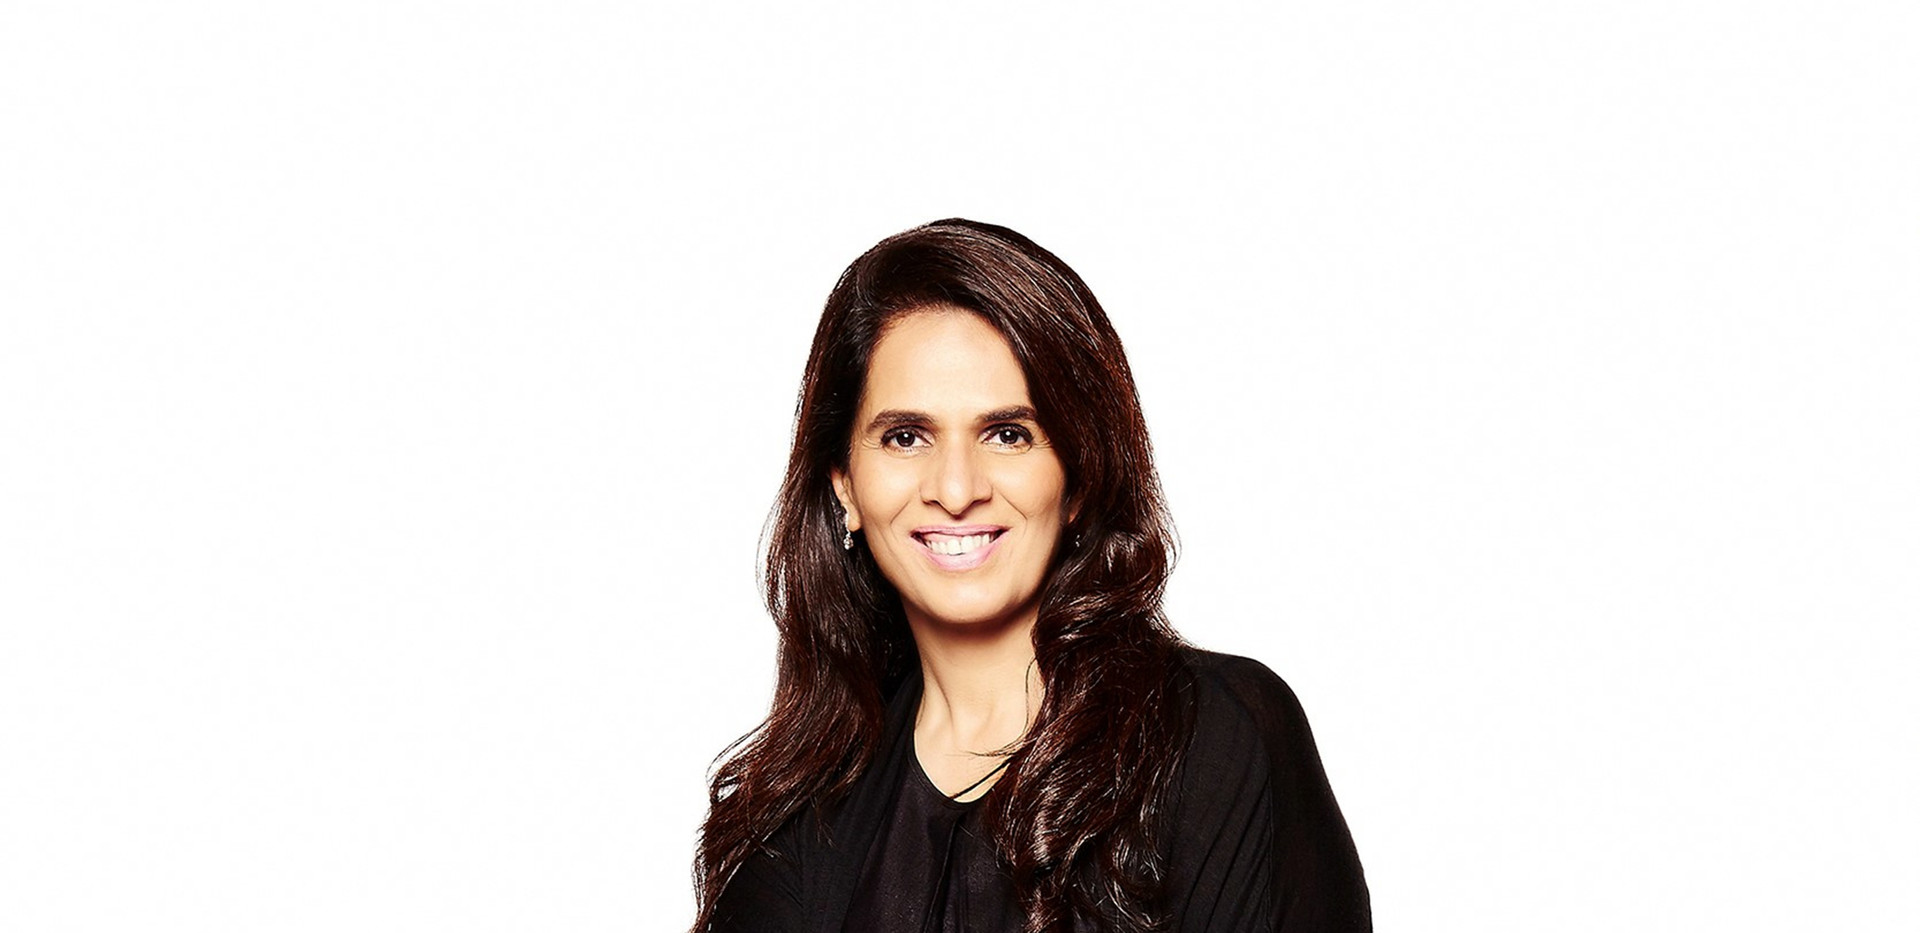 Anita | India